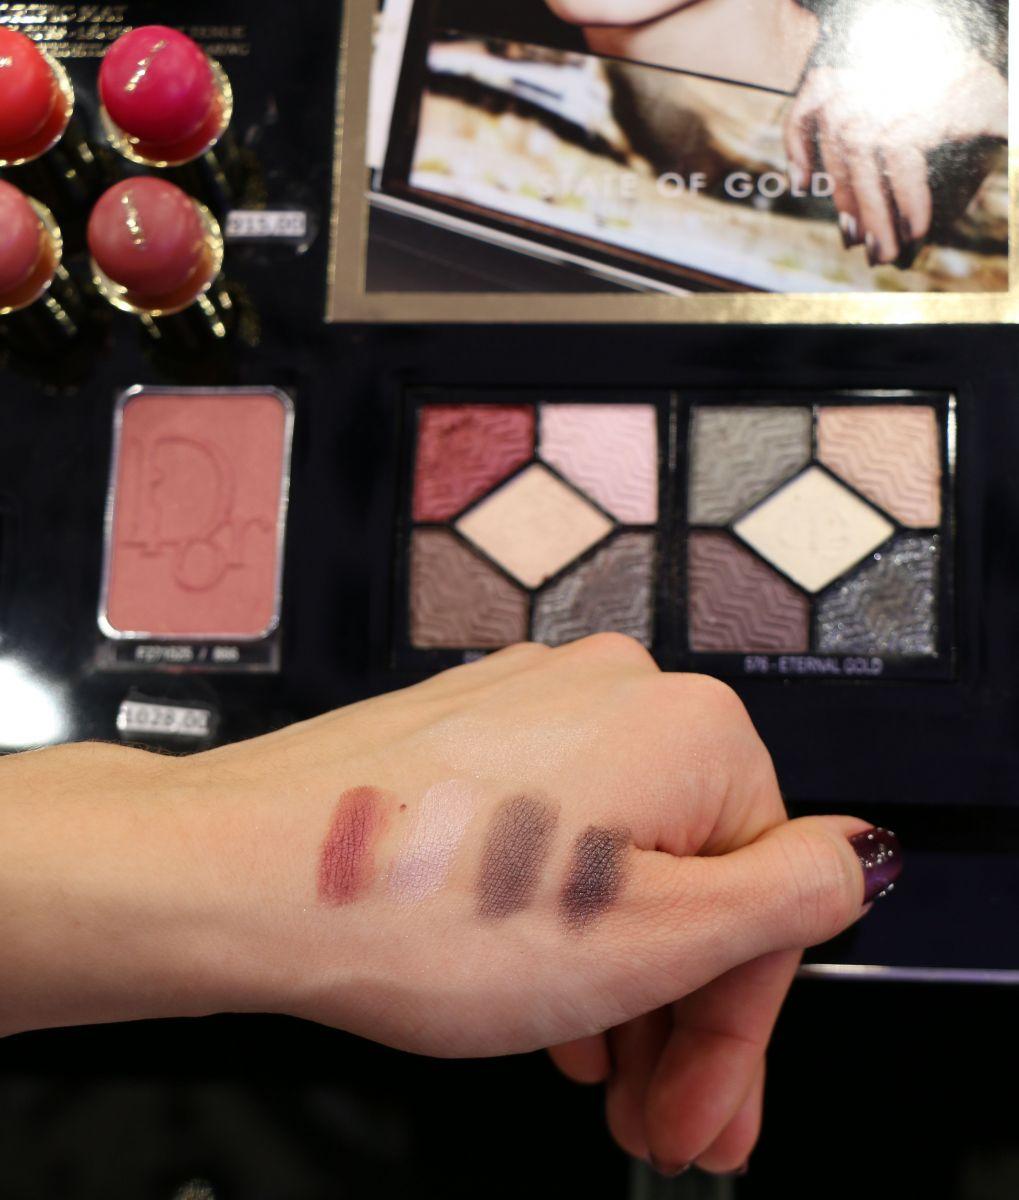 Две пятицветные палетки теней для век 5 Couleurs Couture Colours and Effects Eyeshadow Palette